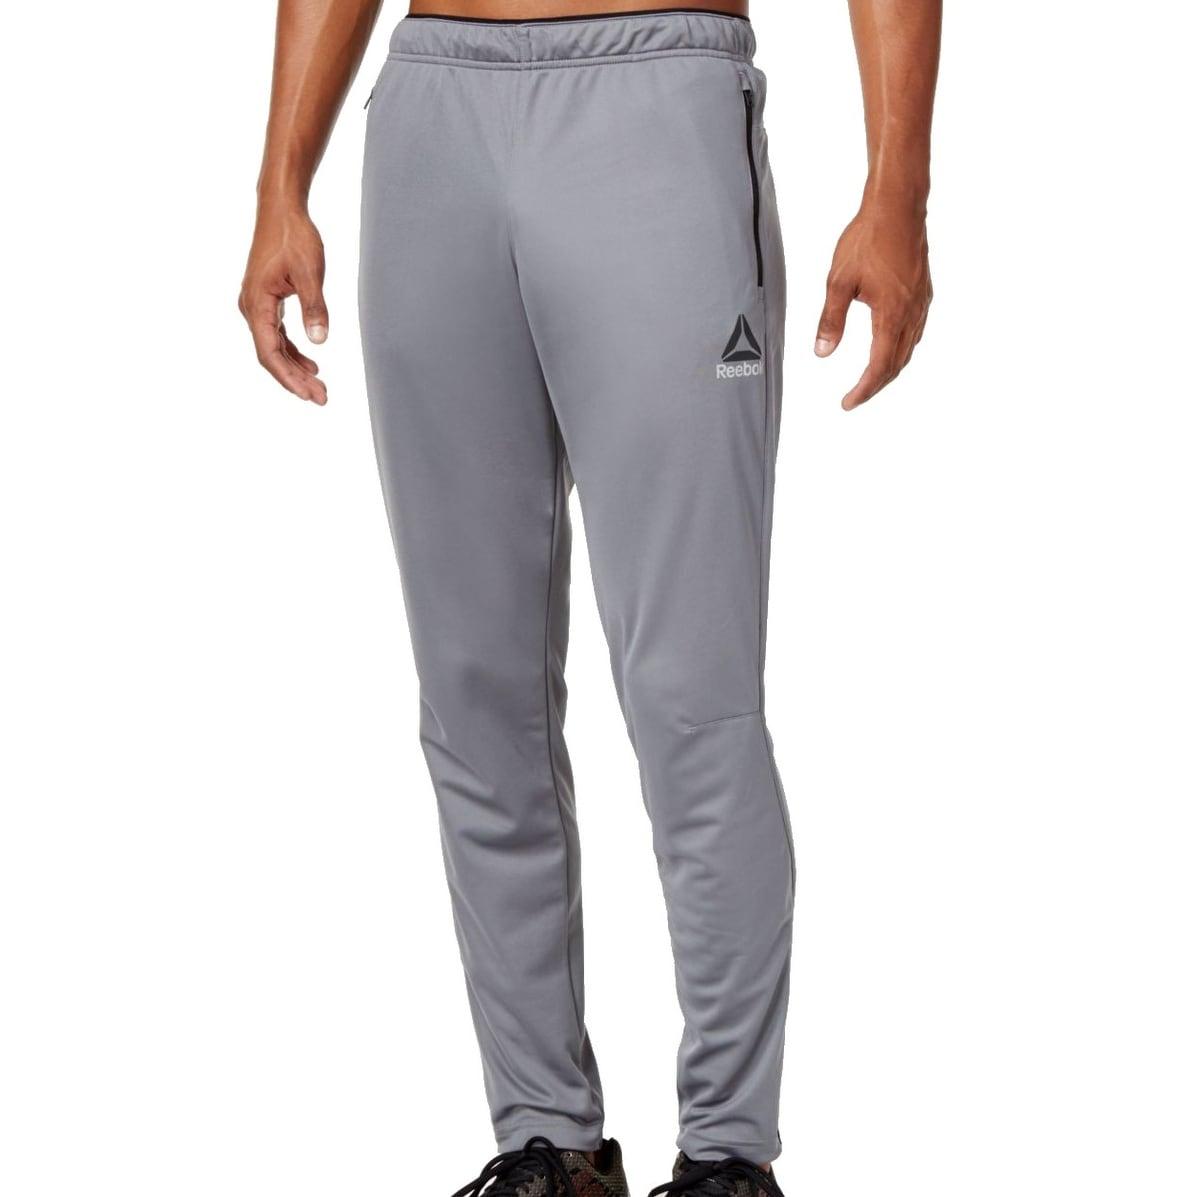 b89b53e42b637 Shop Reebok NEW Gray Mens Size XL Speedwick Performance Slim Track Pants -  Free Shipping On Orders Over  45 - Overstock - 20883832